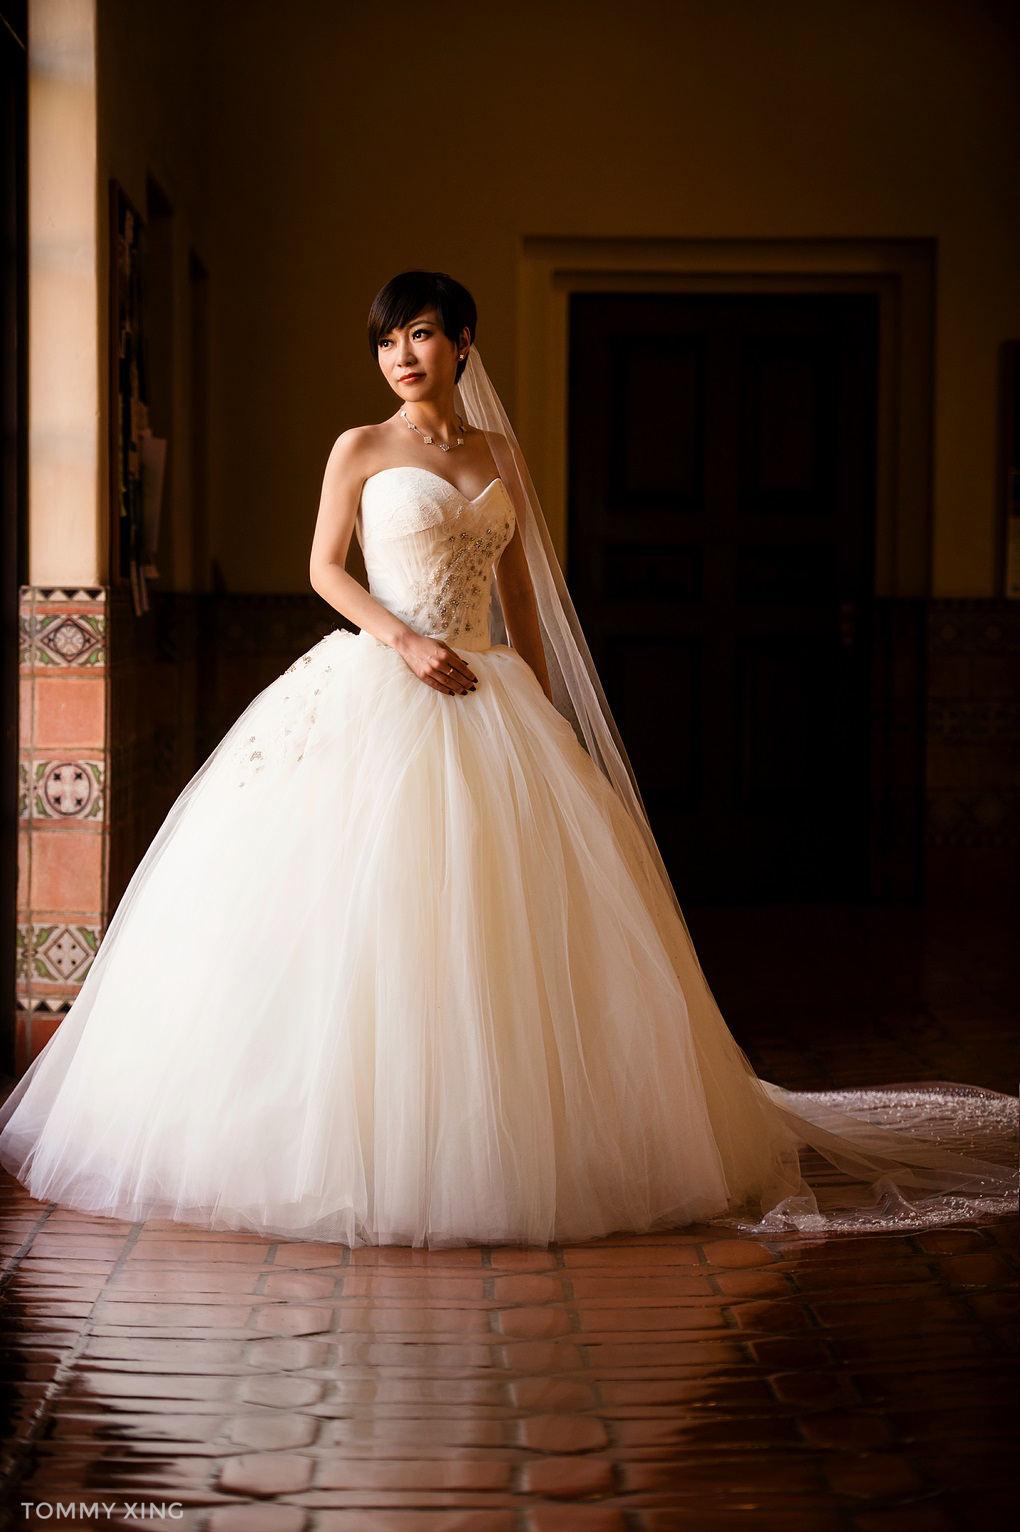 洛杉矶婚纱照 - Los Angeles Pre Wedding - Tommy Xing03.jpg